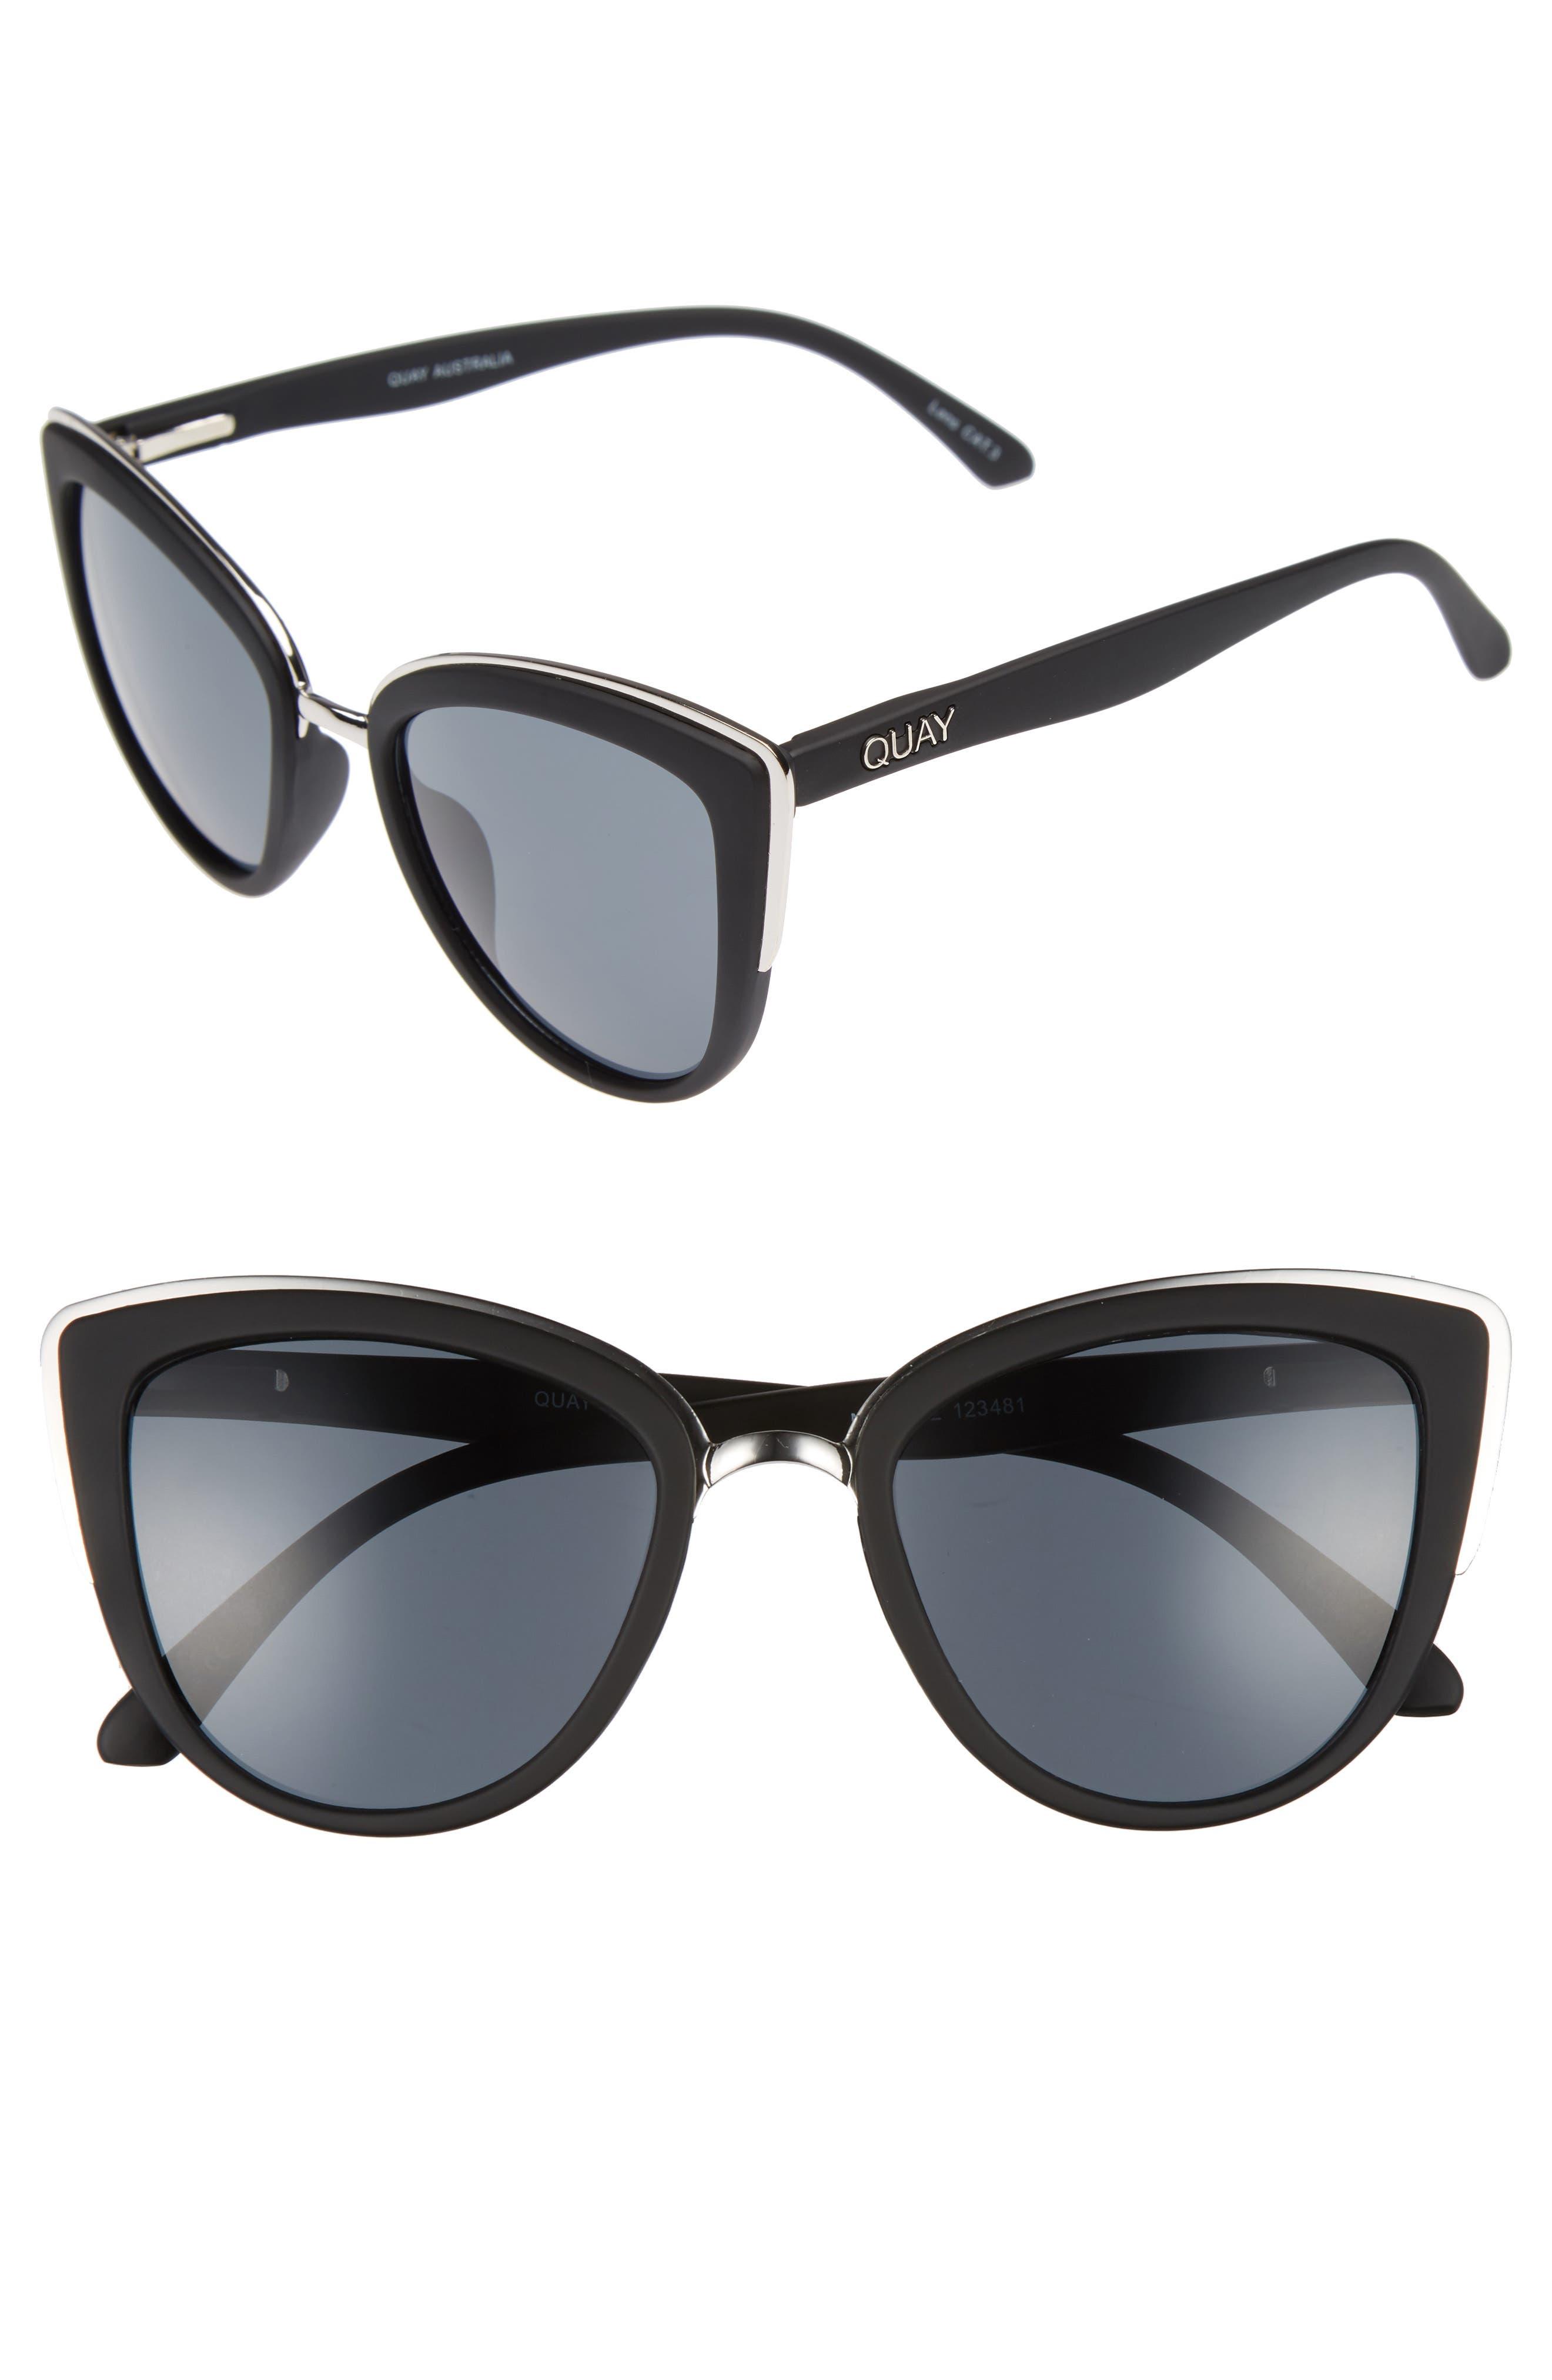 'My Girl' 50mm Cat Eye Sunglasses,                             Main thumbnail 1, color,                             BLACK/ SMOKE LENS